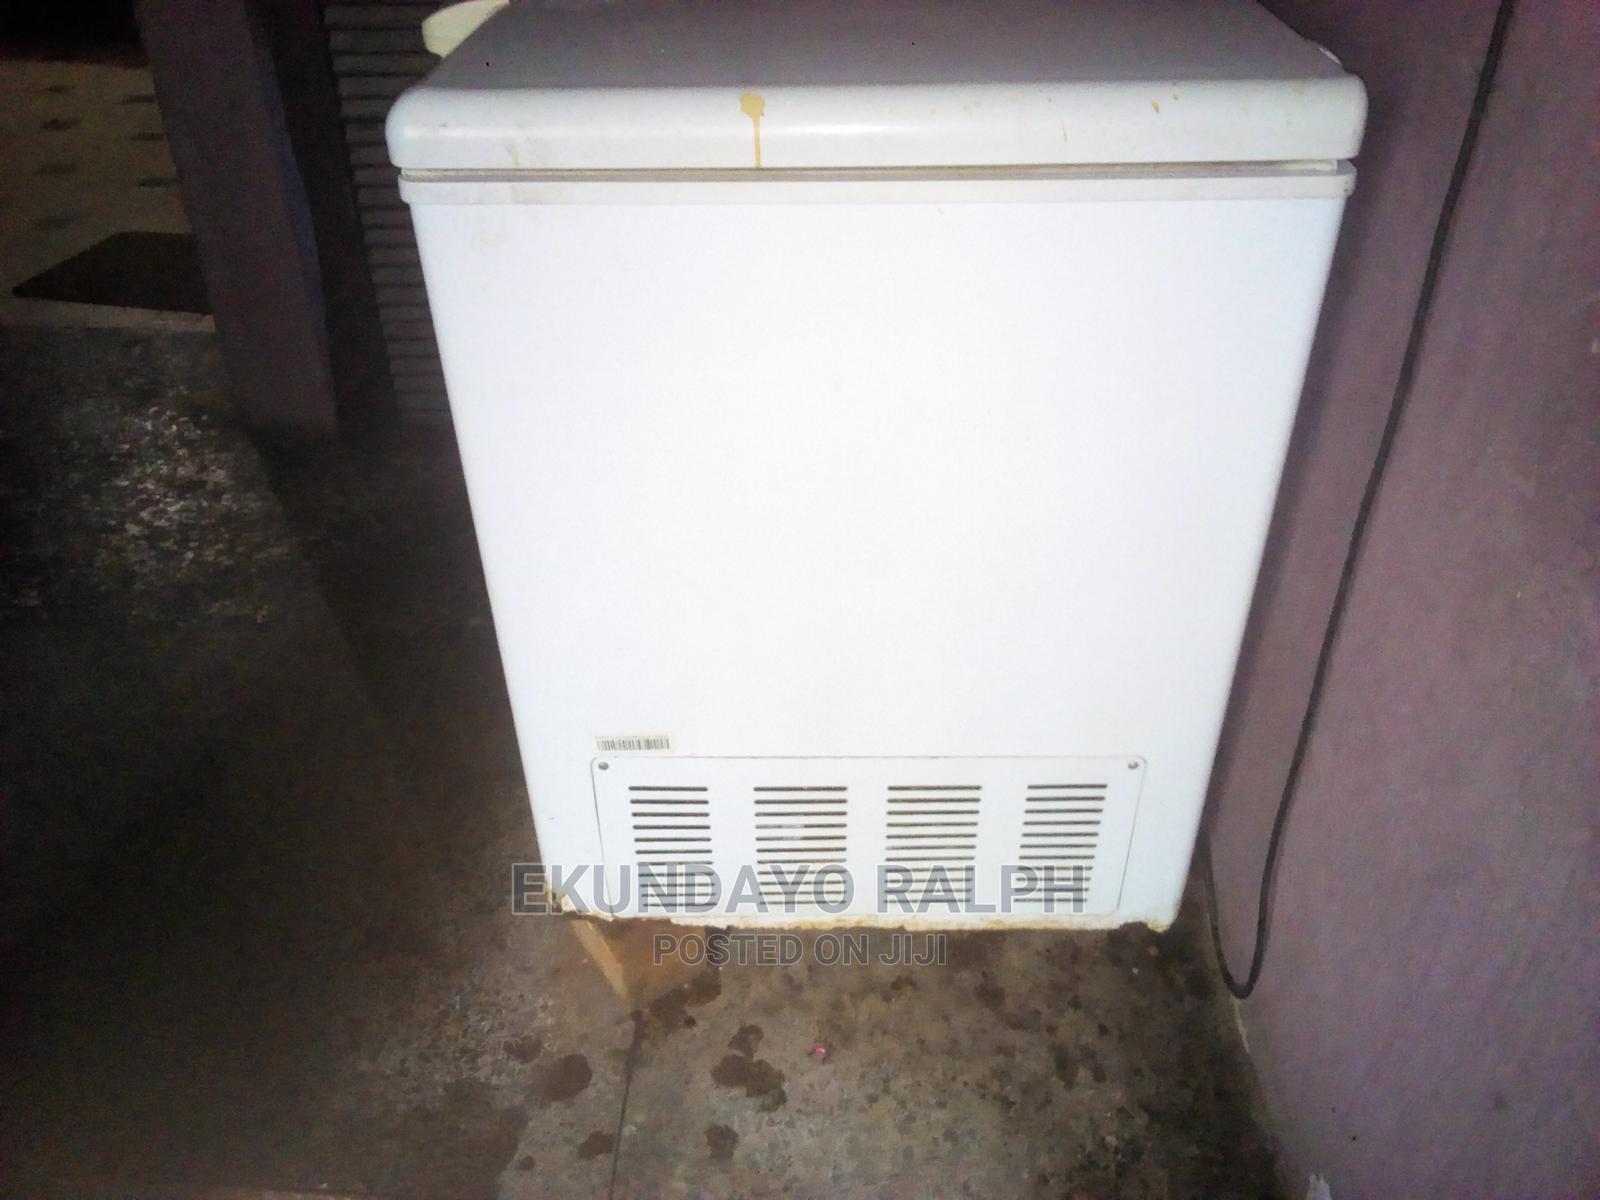 Haier Thermocool Chest Freezer   Kitchen Appliances for sale in Alimosho, Lagos State, Nigeria